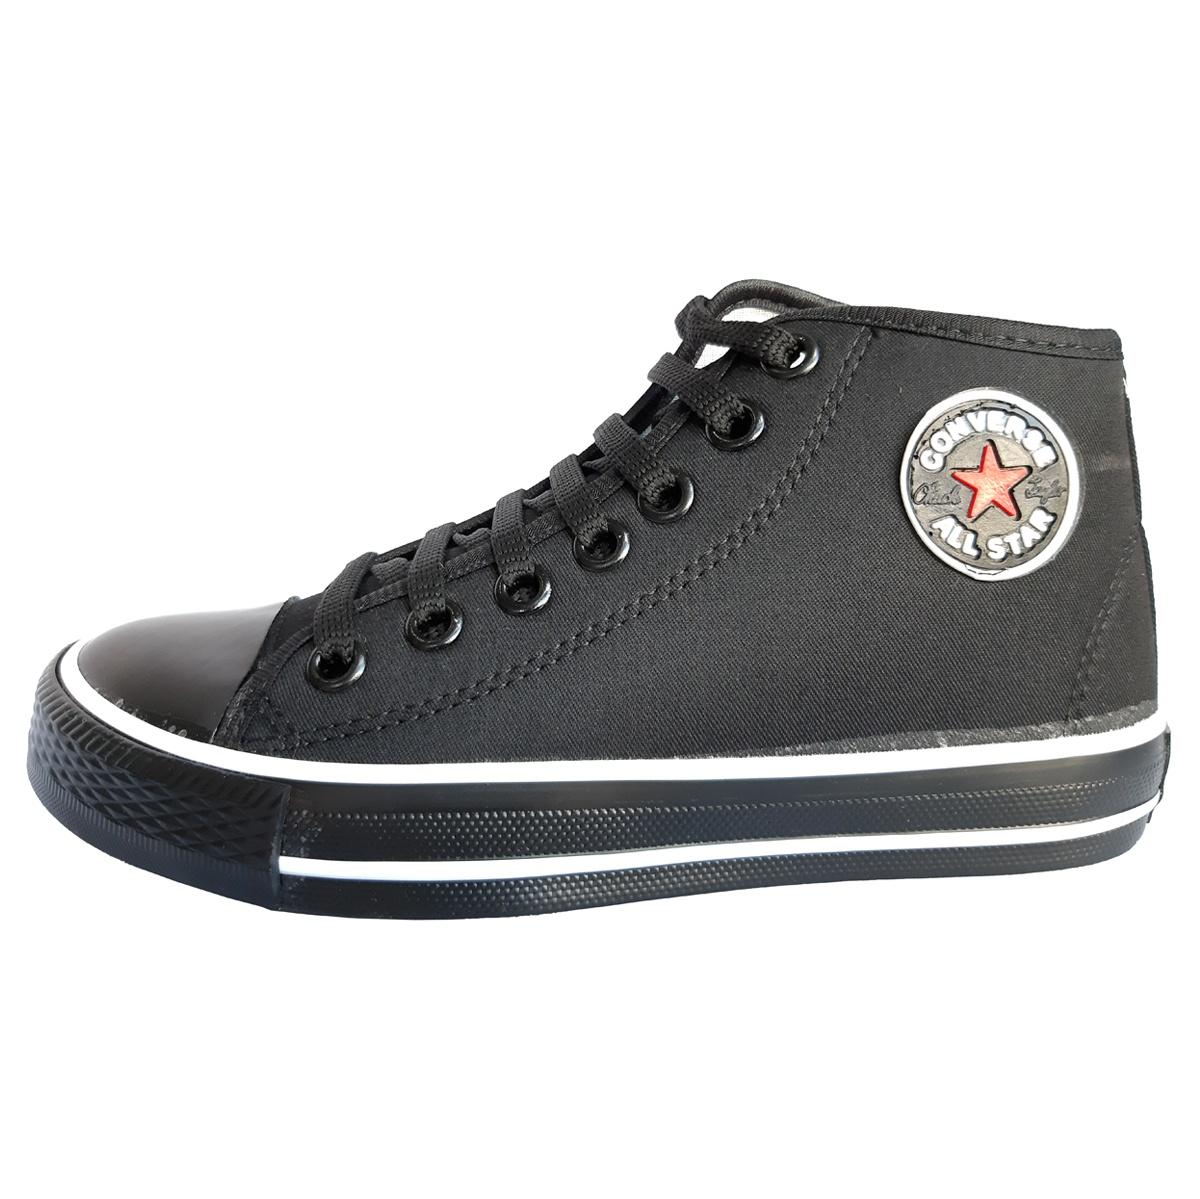 کفش راحتی زنانه مدل lux_019